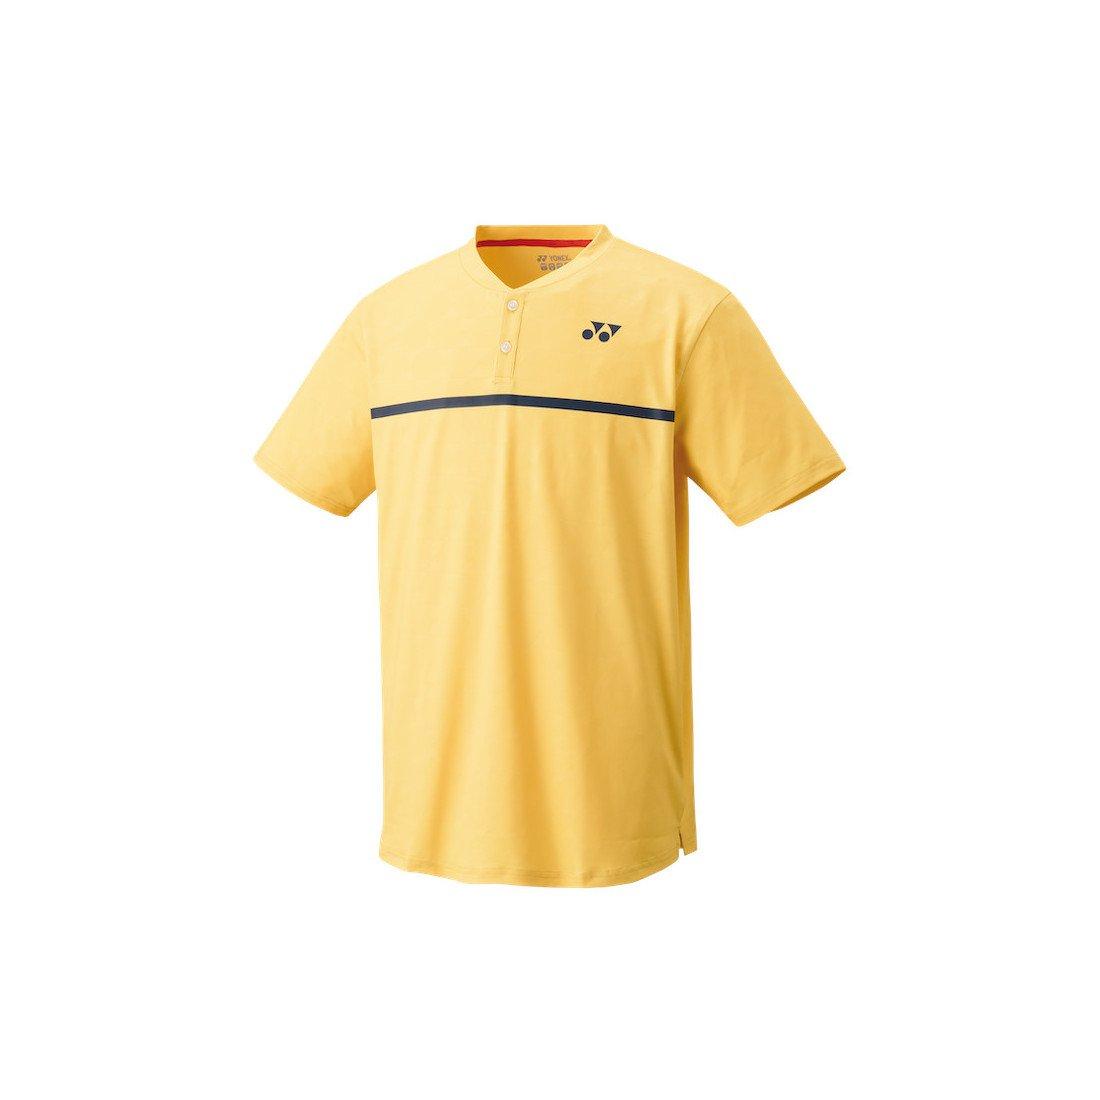 Yonex Men's Henley Tennis Shirt (Slim Fit) [soft yellow]